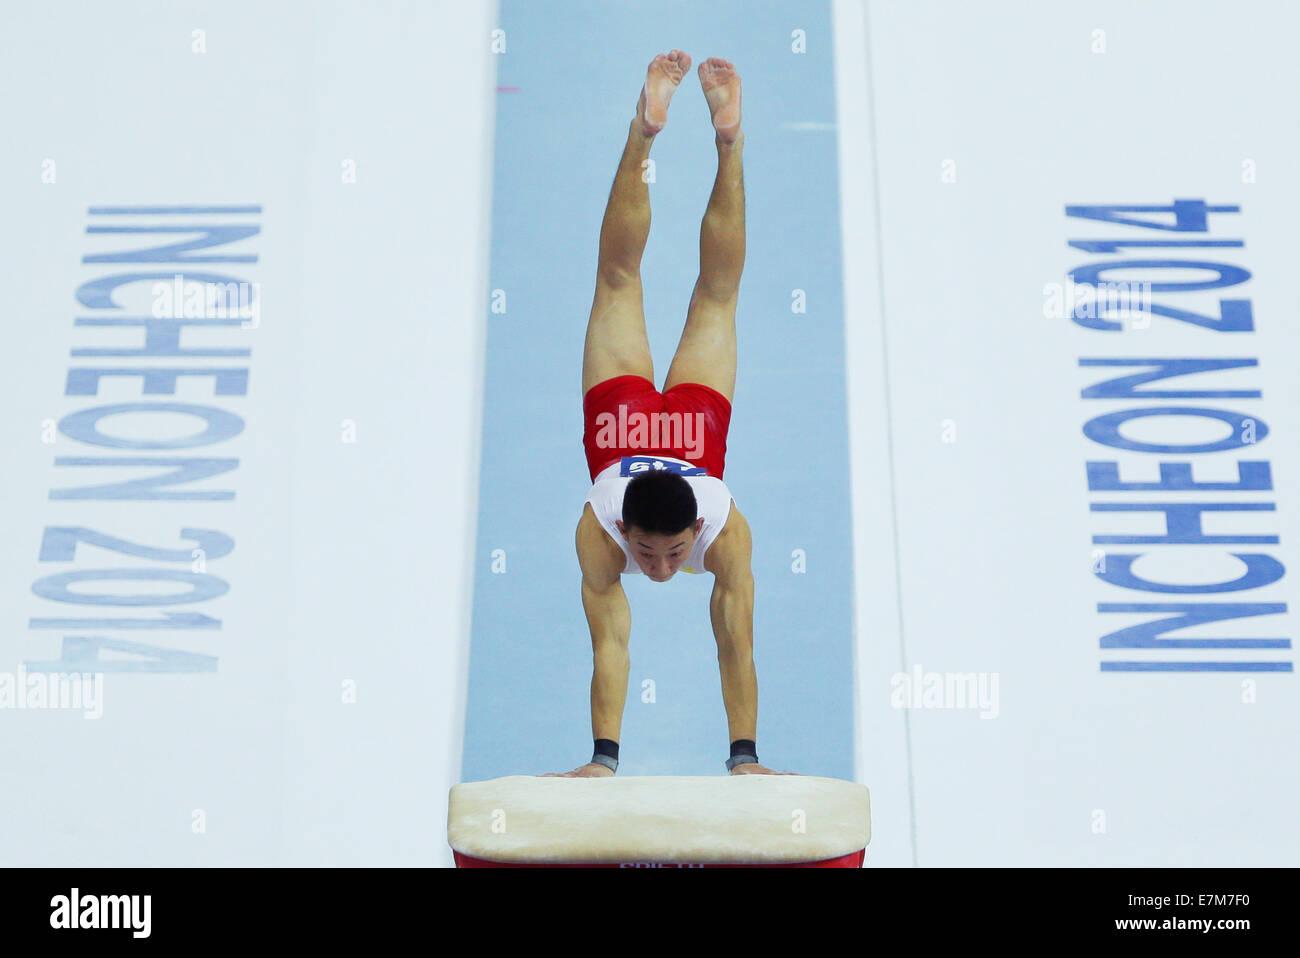 Incheon, South Korea. 21st Sep, 2014. Purevdorj Otgonbat of Mongolia competes during the vault of men's gymnastics Stock Photo